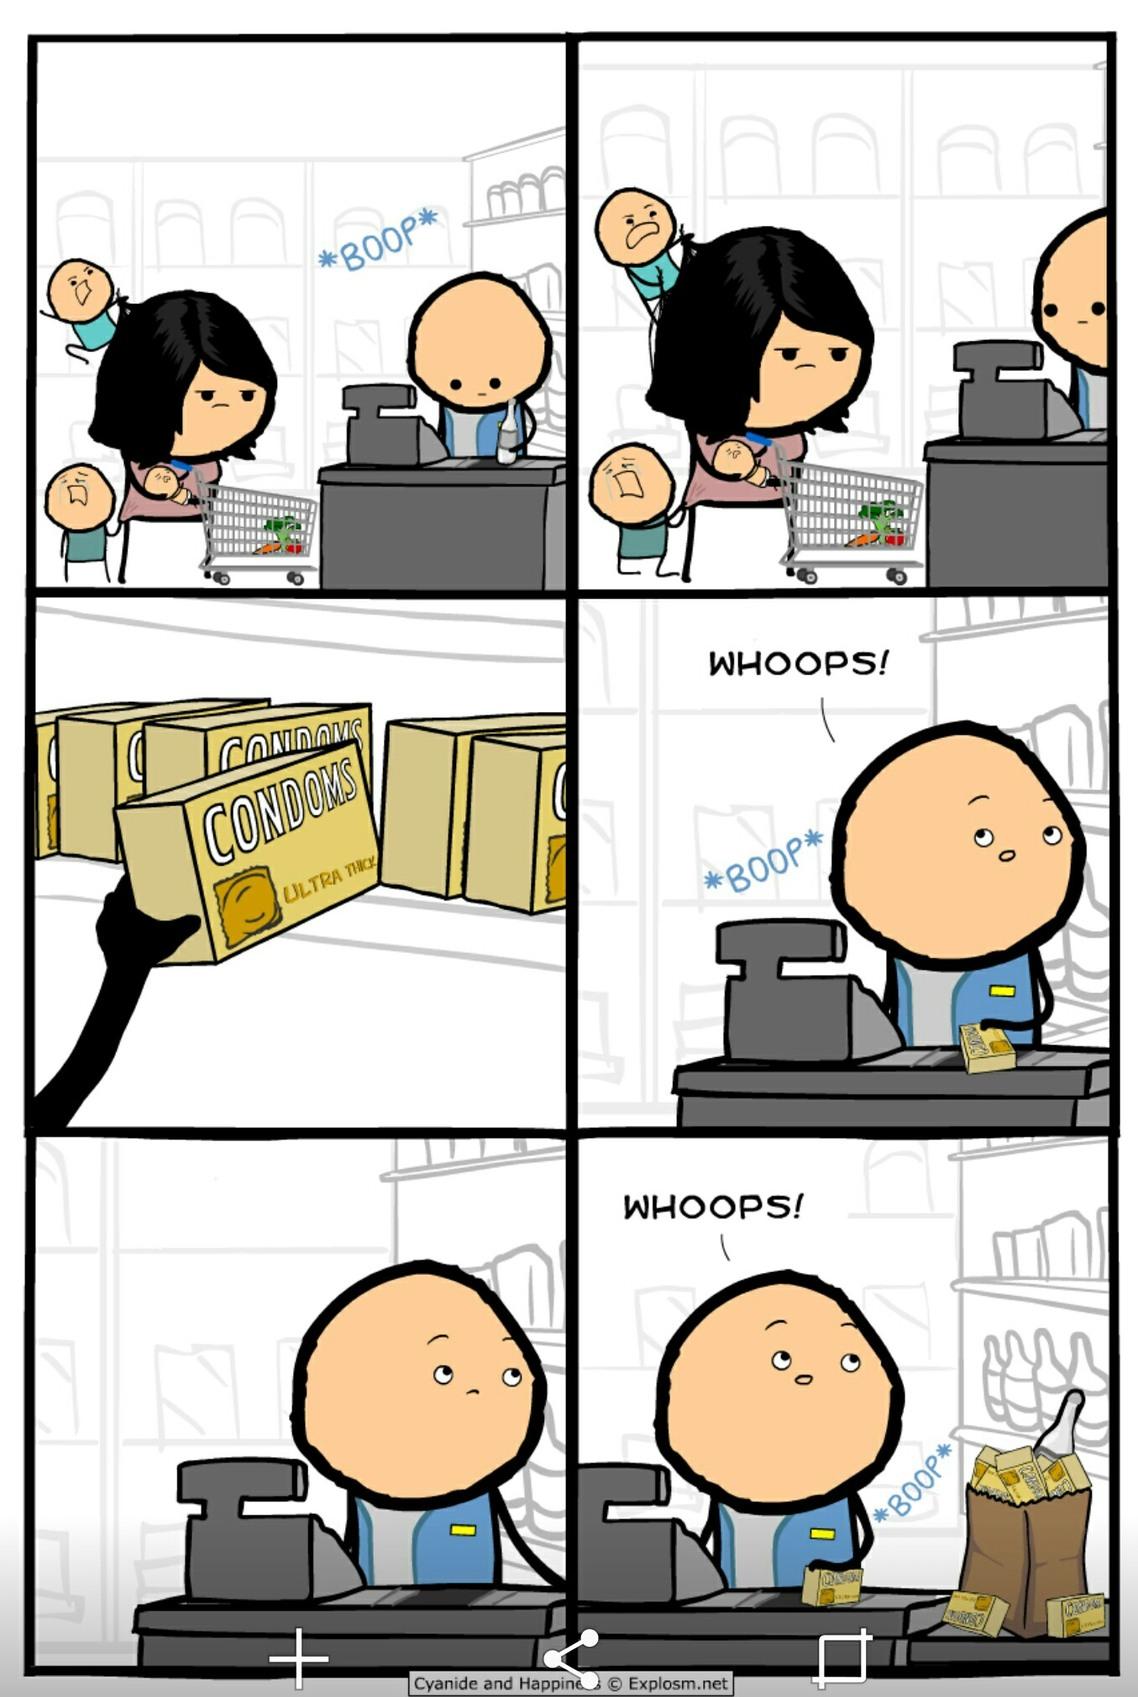 Babyboom - meme